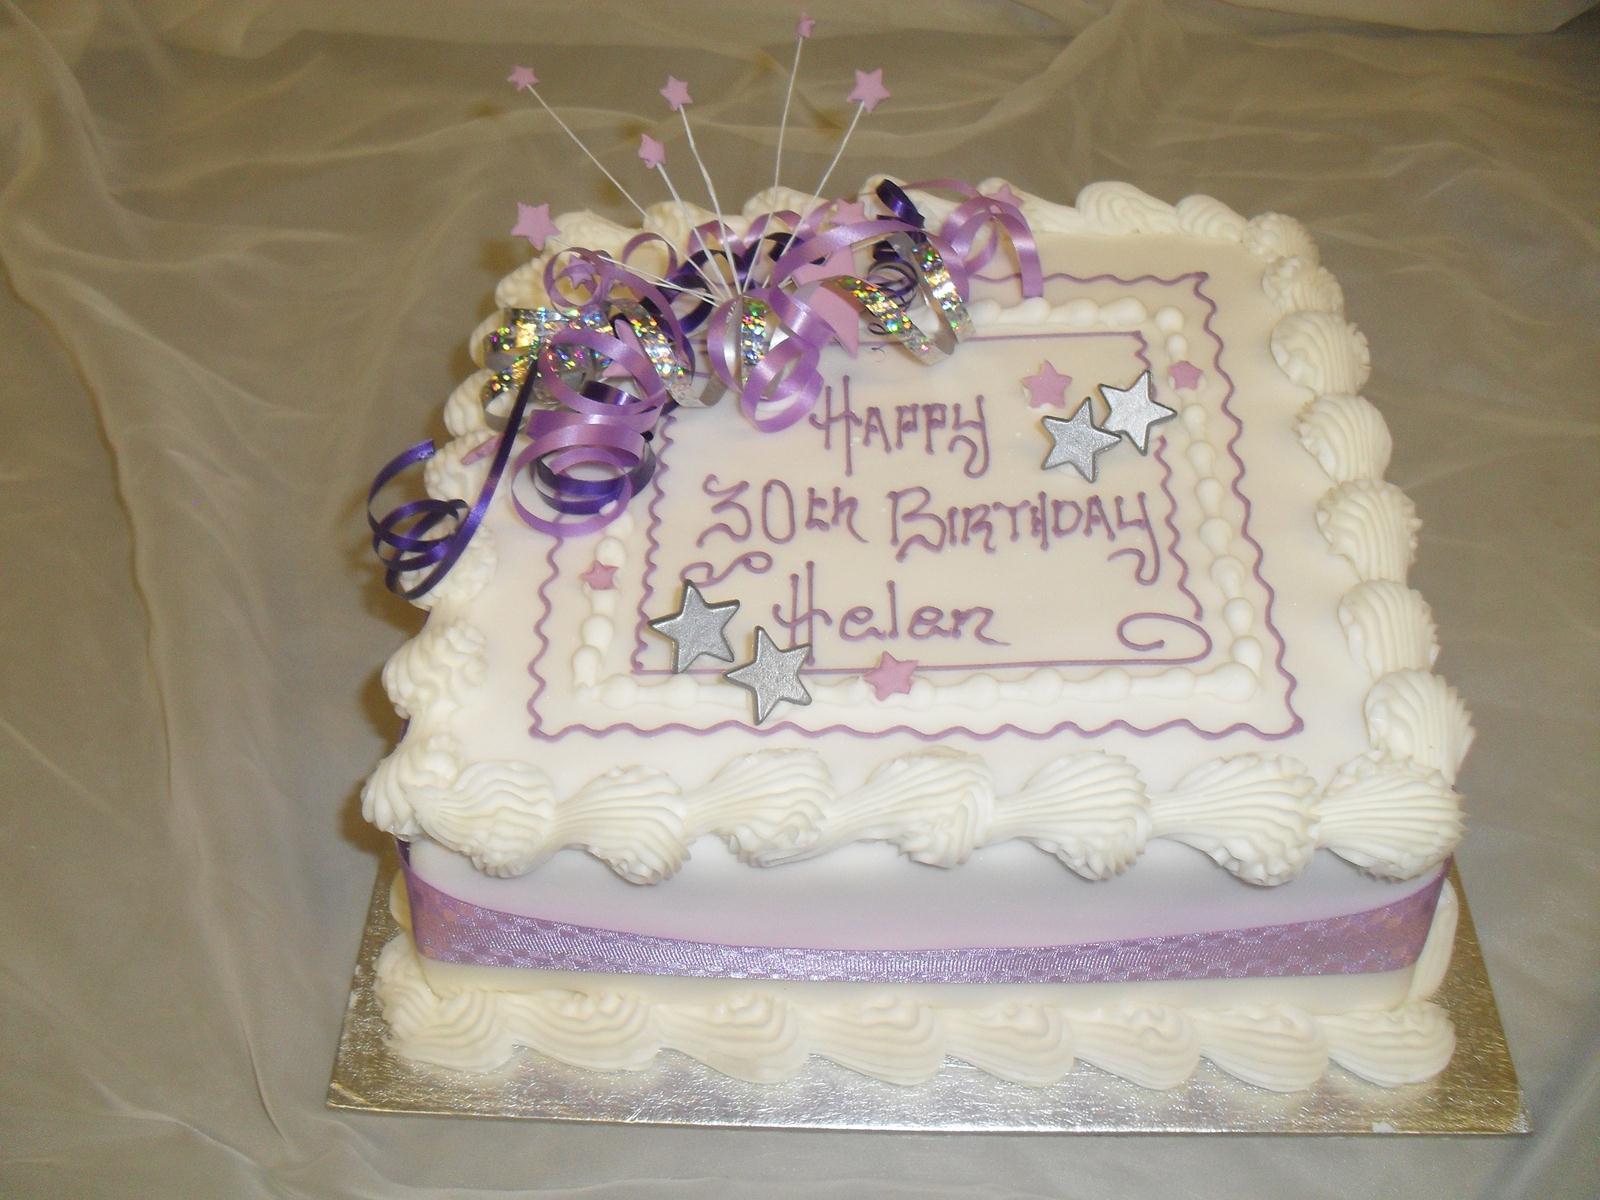 Amazing Happy Birthday Cake Wallpapers Hd 1600x1200